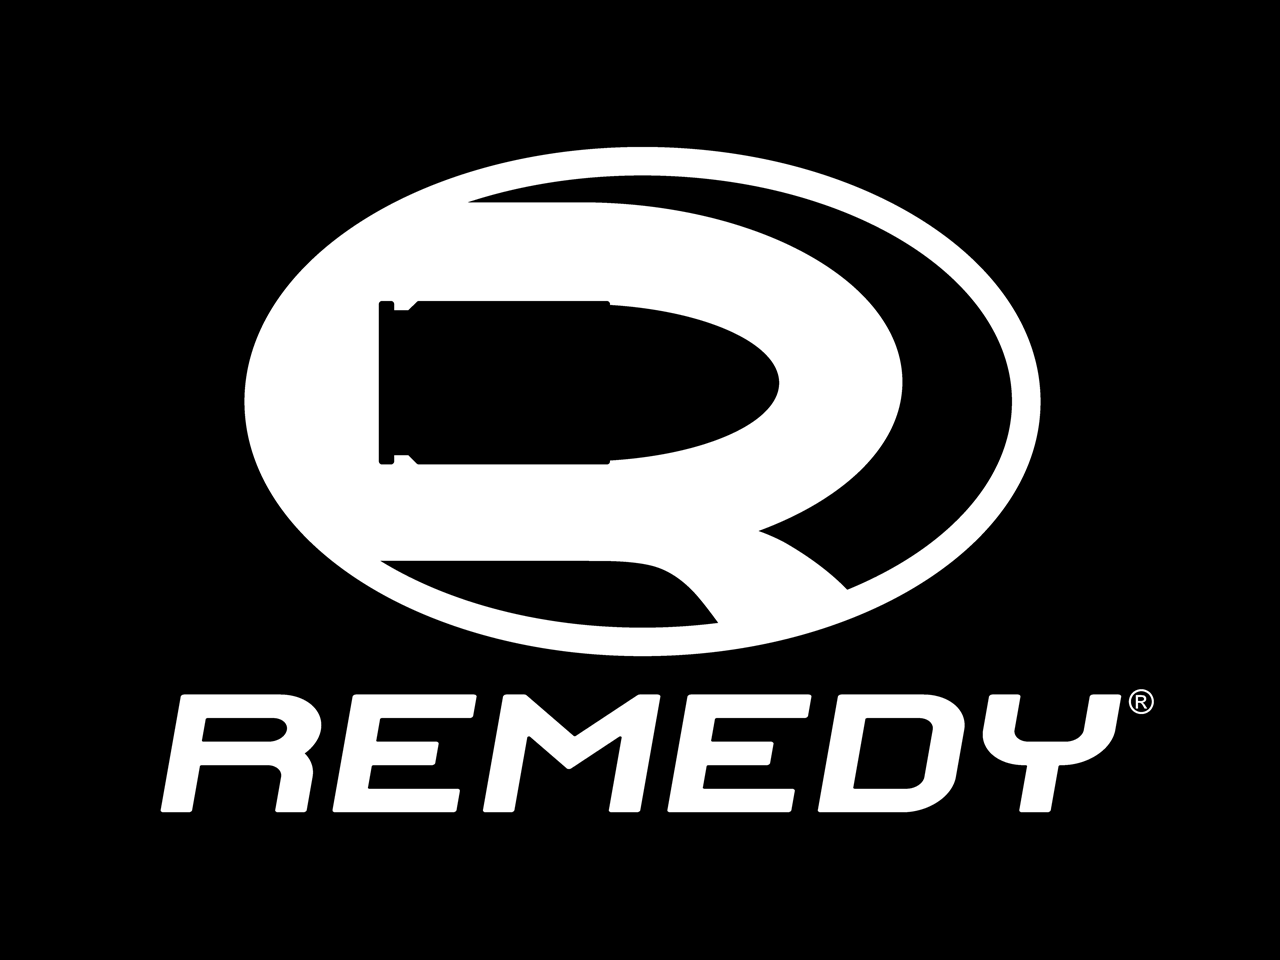 Remedy发行100万股股票 筹集资金4千余万欧元